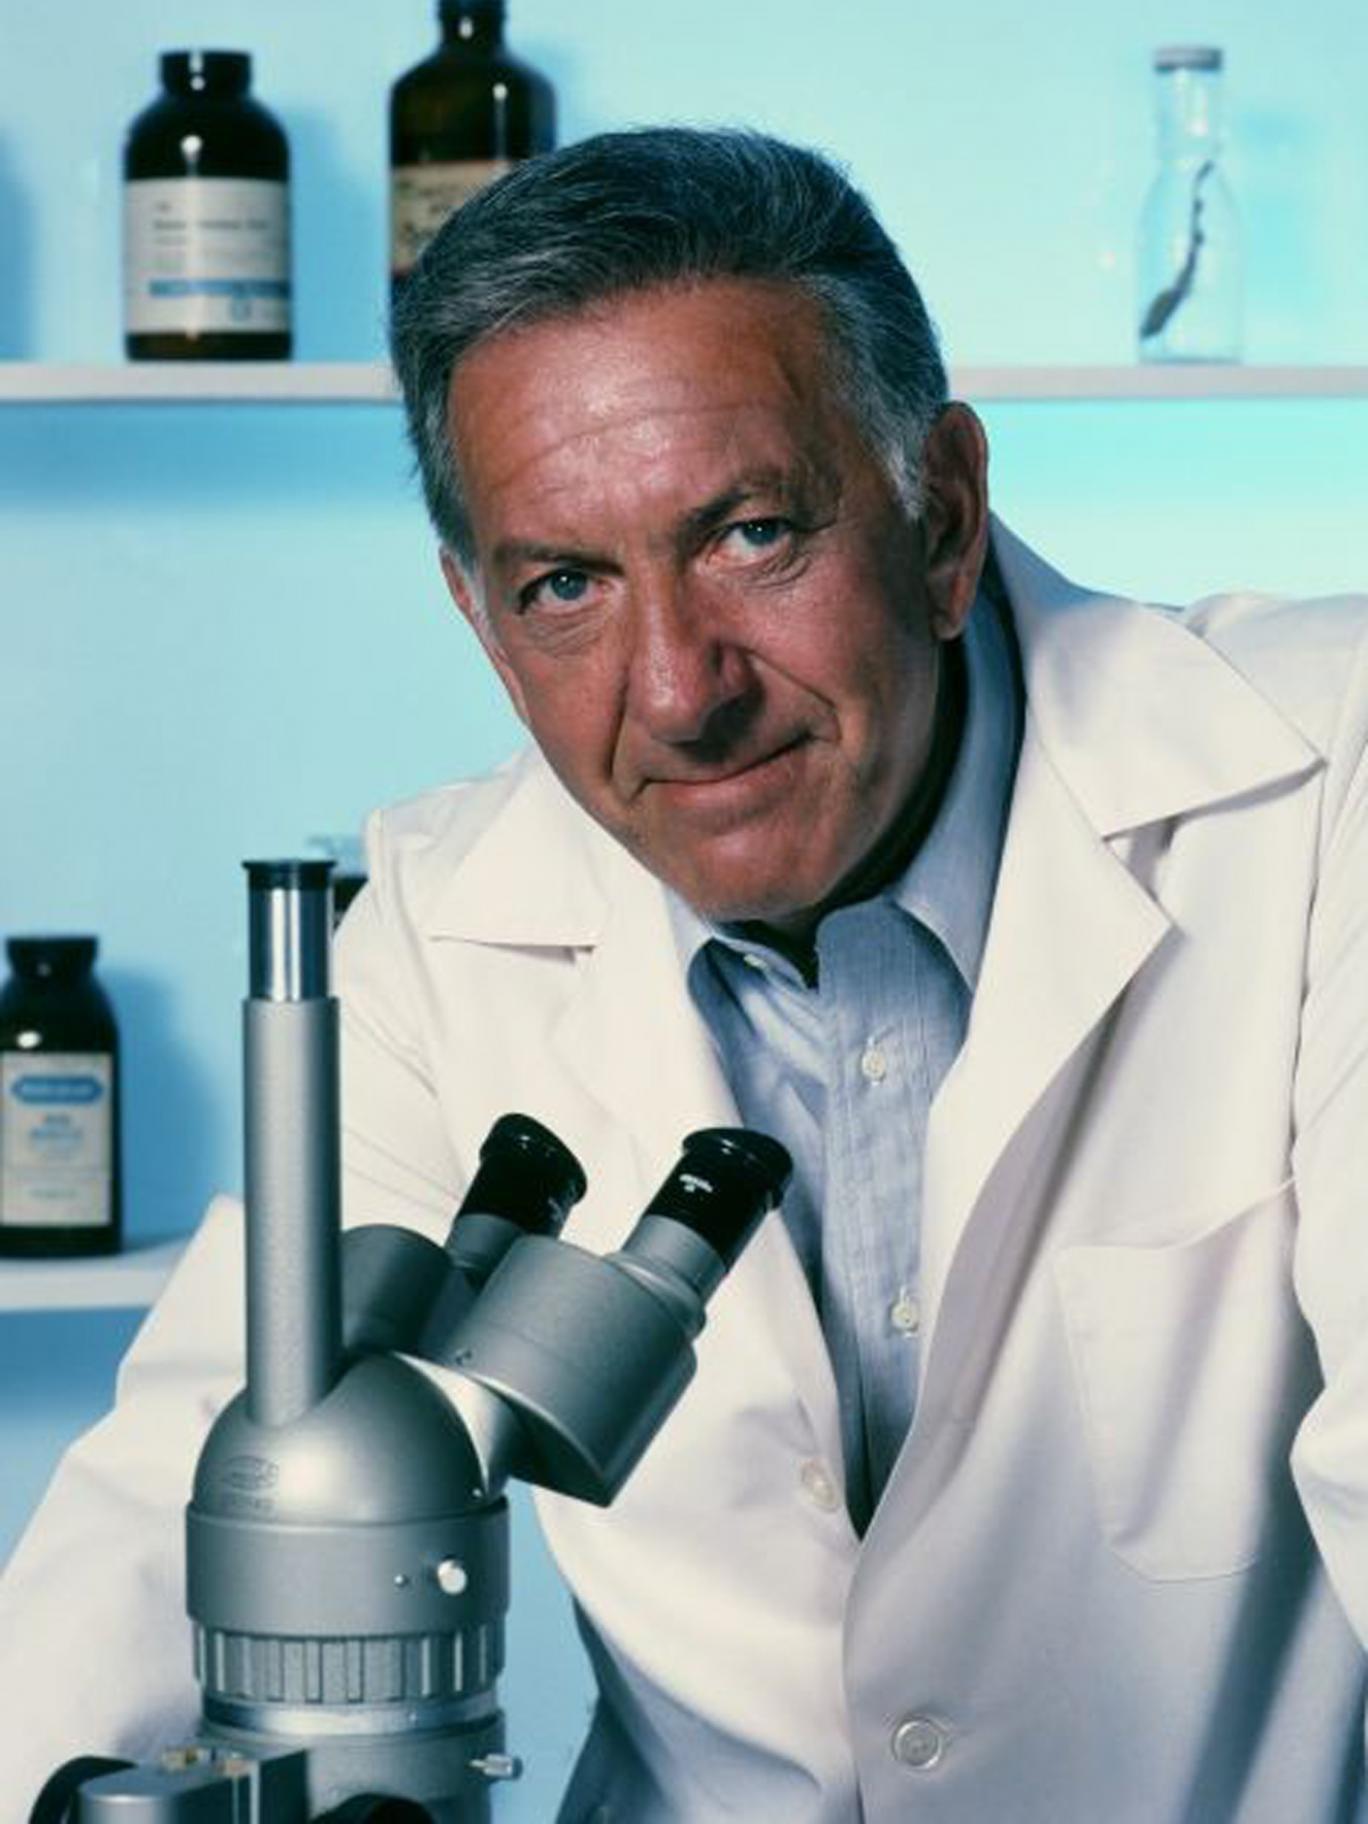 Klugman in 'Quincy ME', a precursor to today's CSI genre